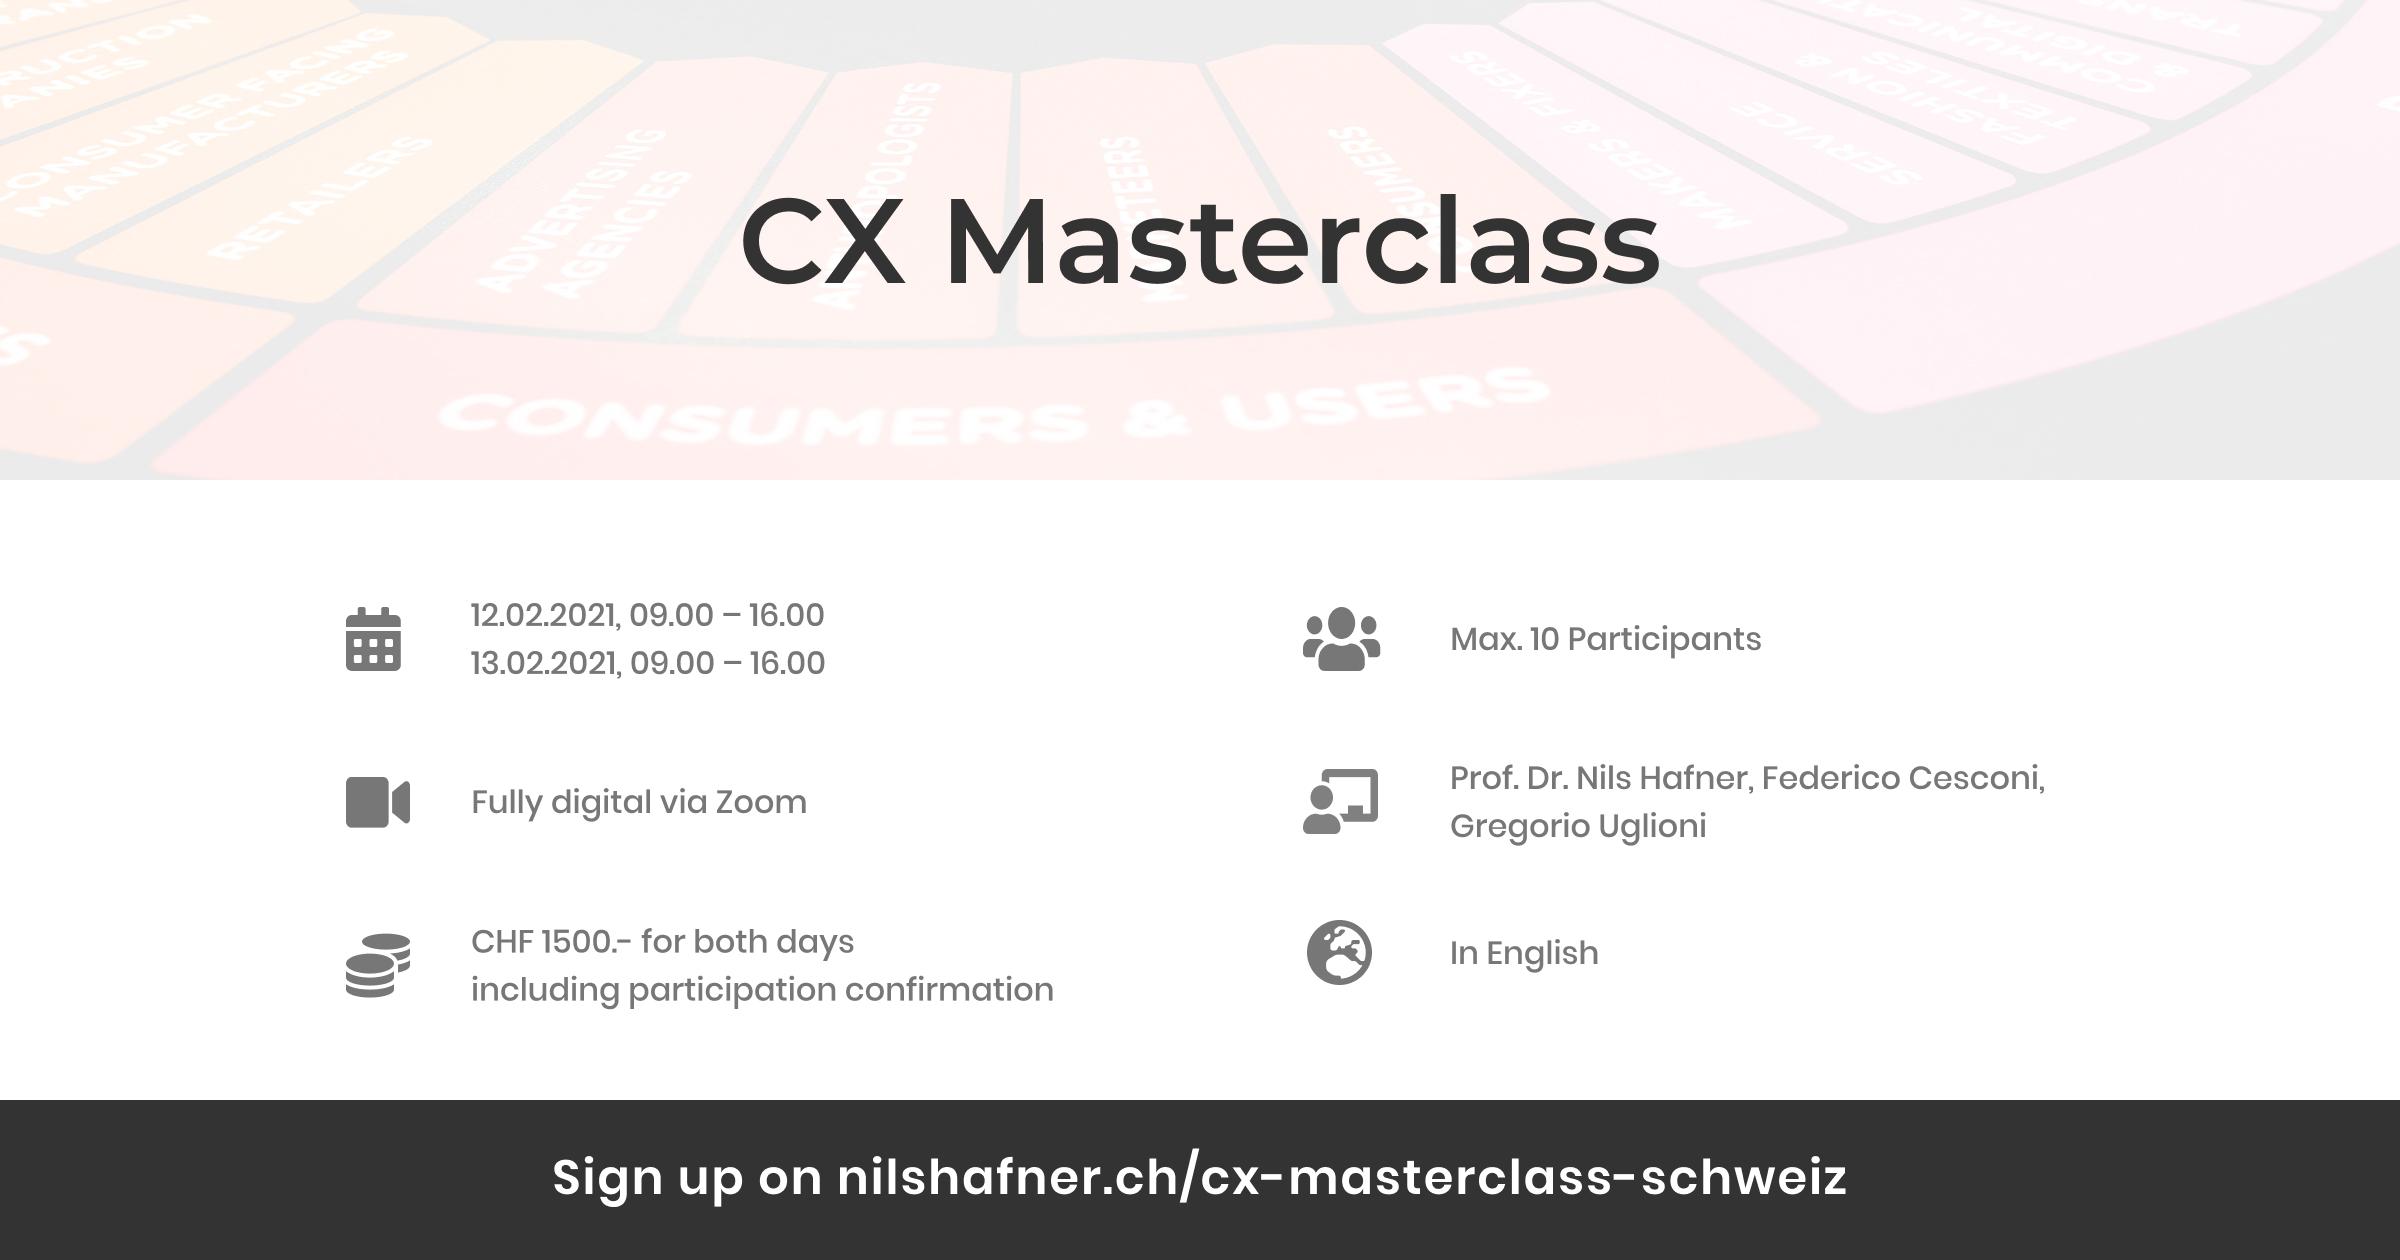 CX Masterclass - Social Meta